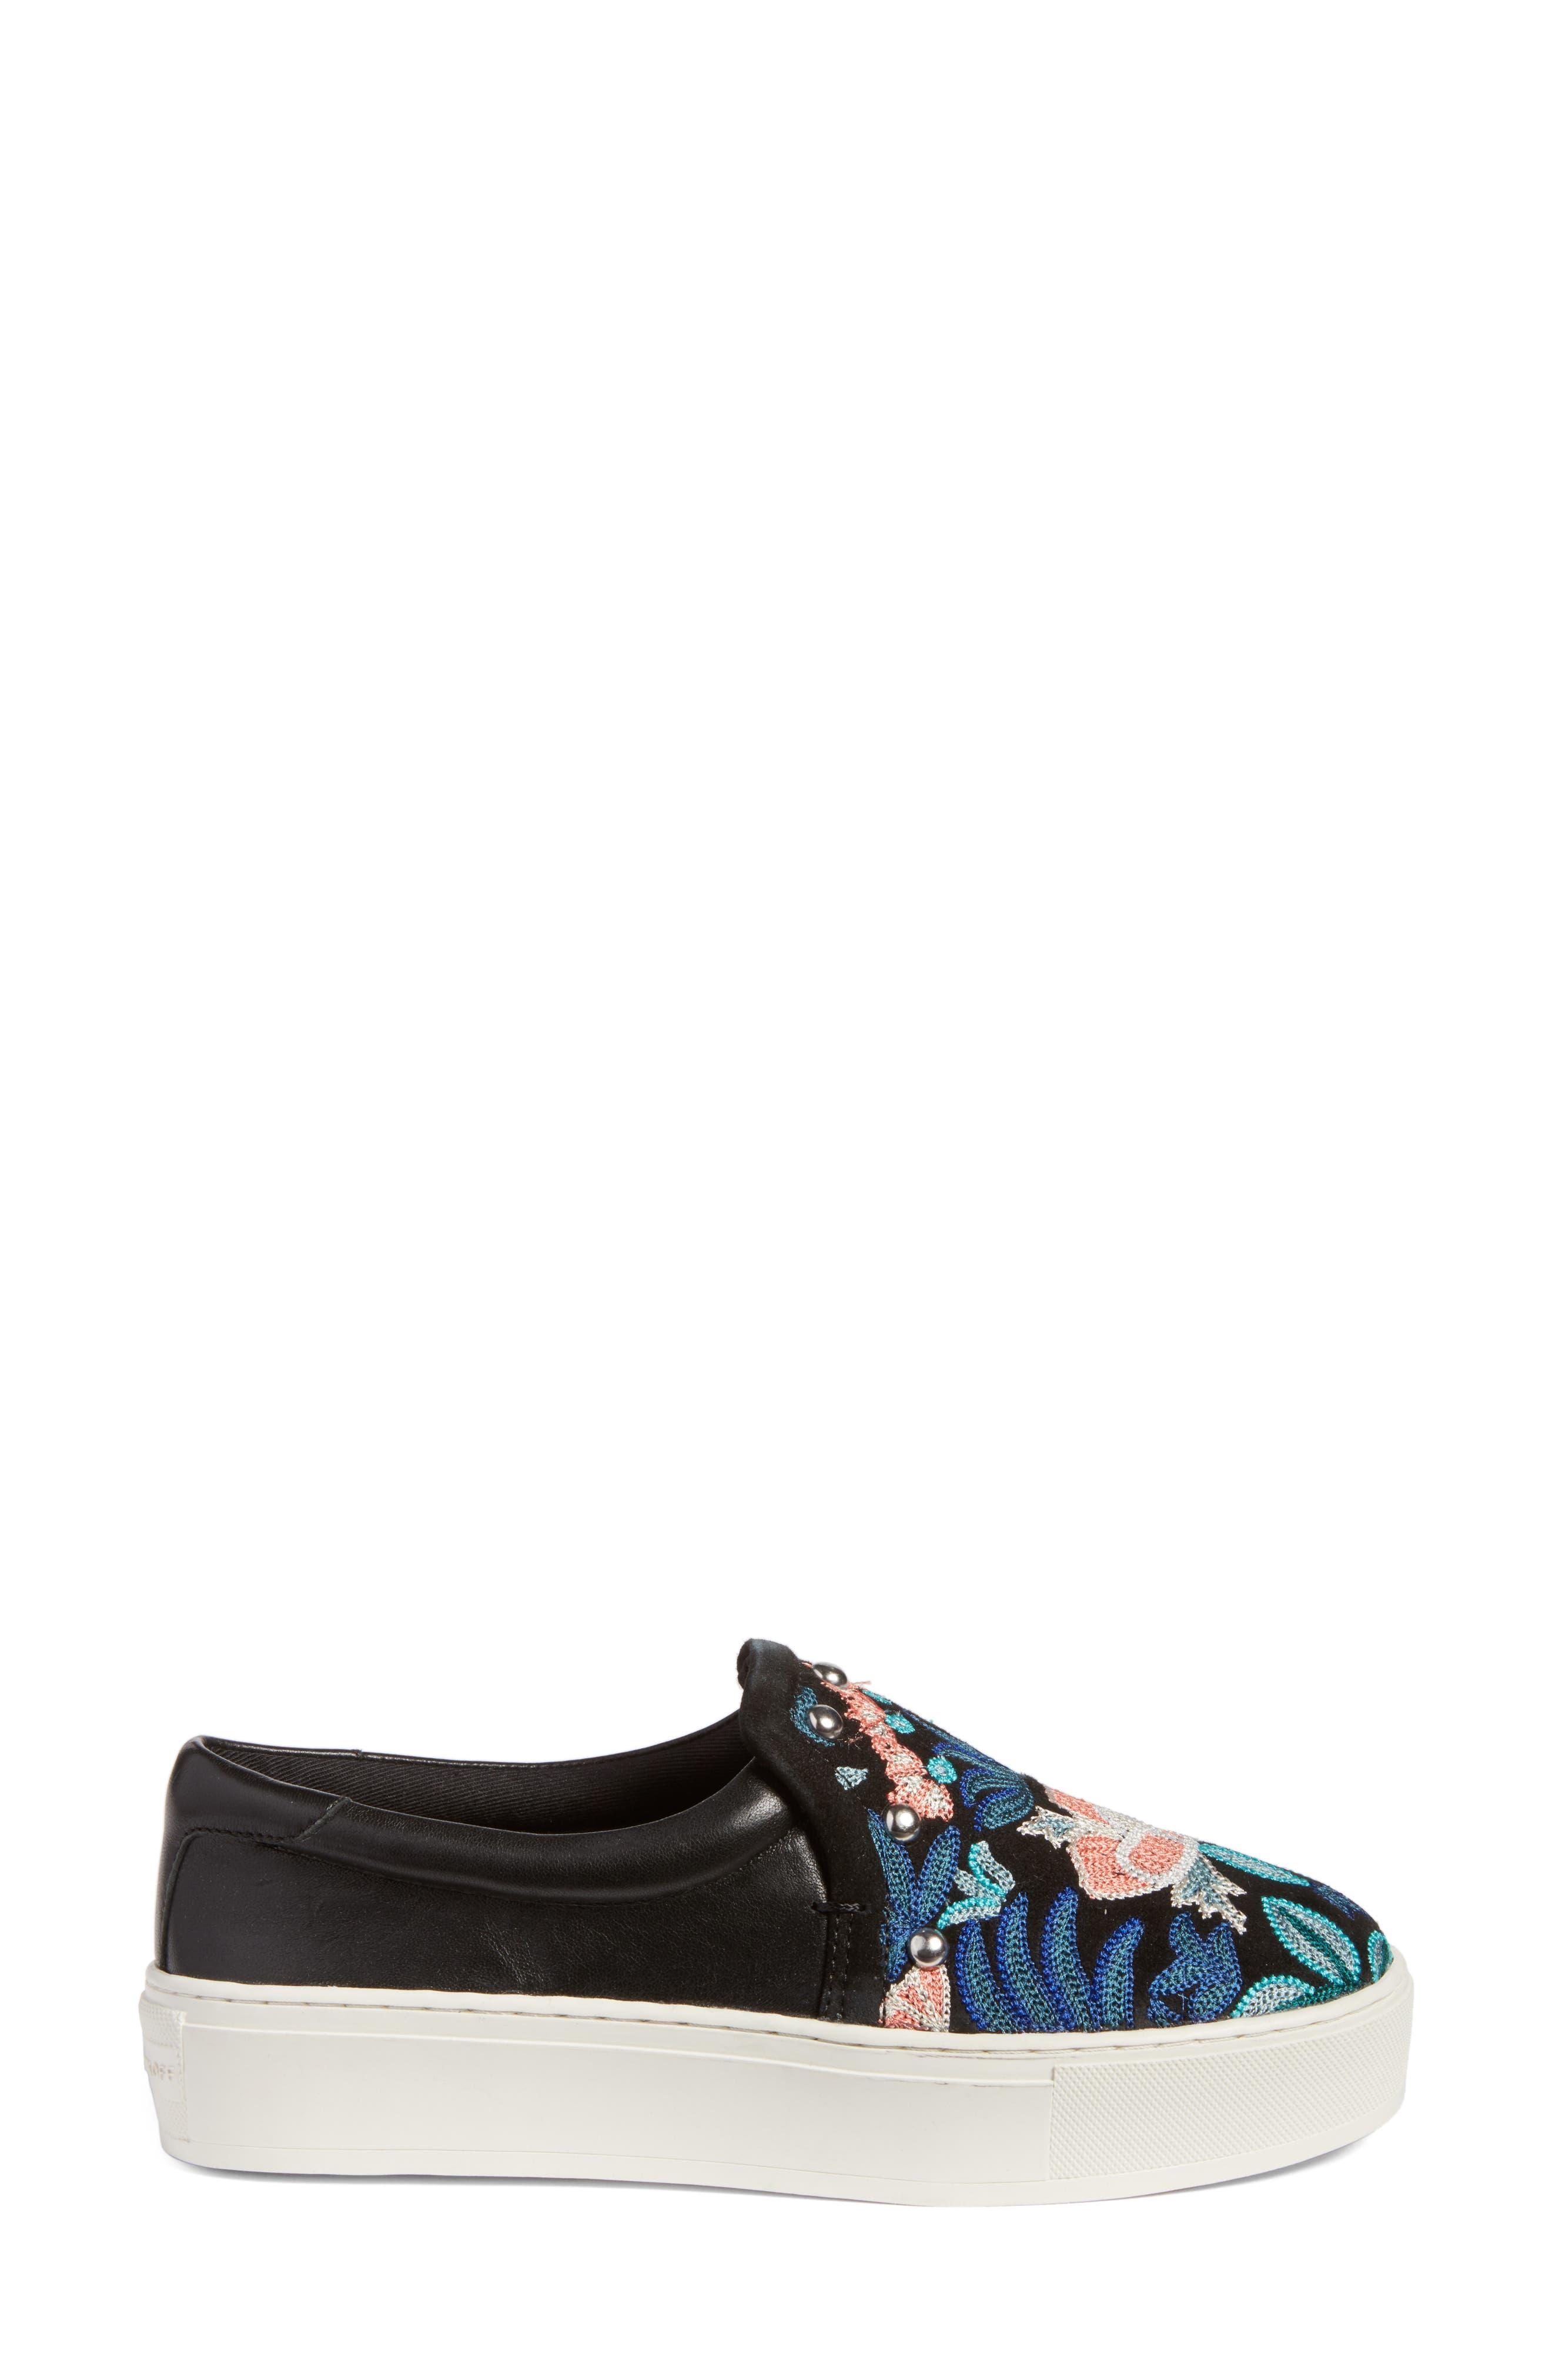 Alternate Image 3  - Rebecca Minkoff Noelle Embellished Slip-On Platform Sneaker (Women)